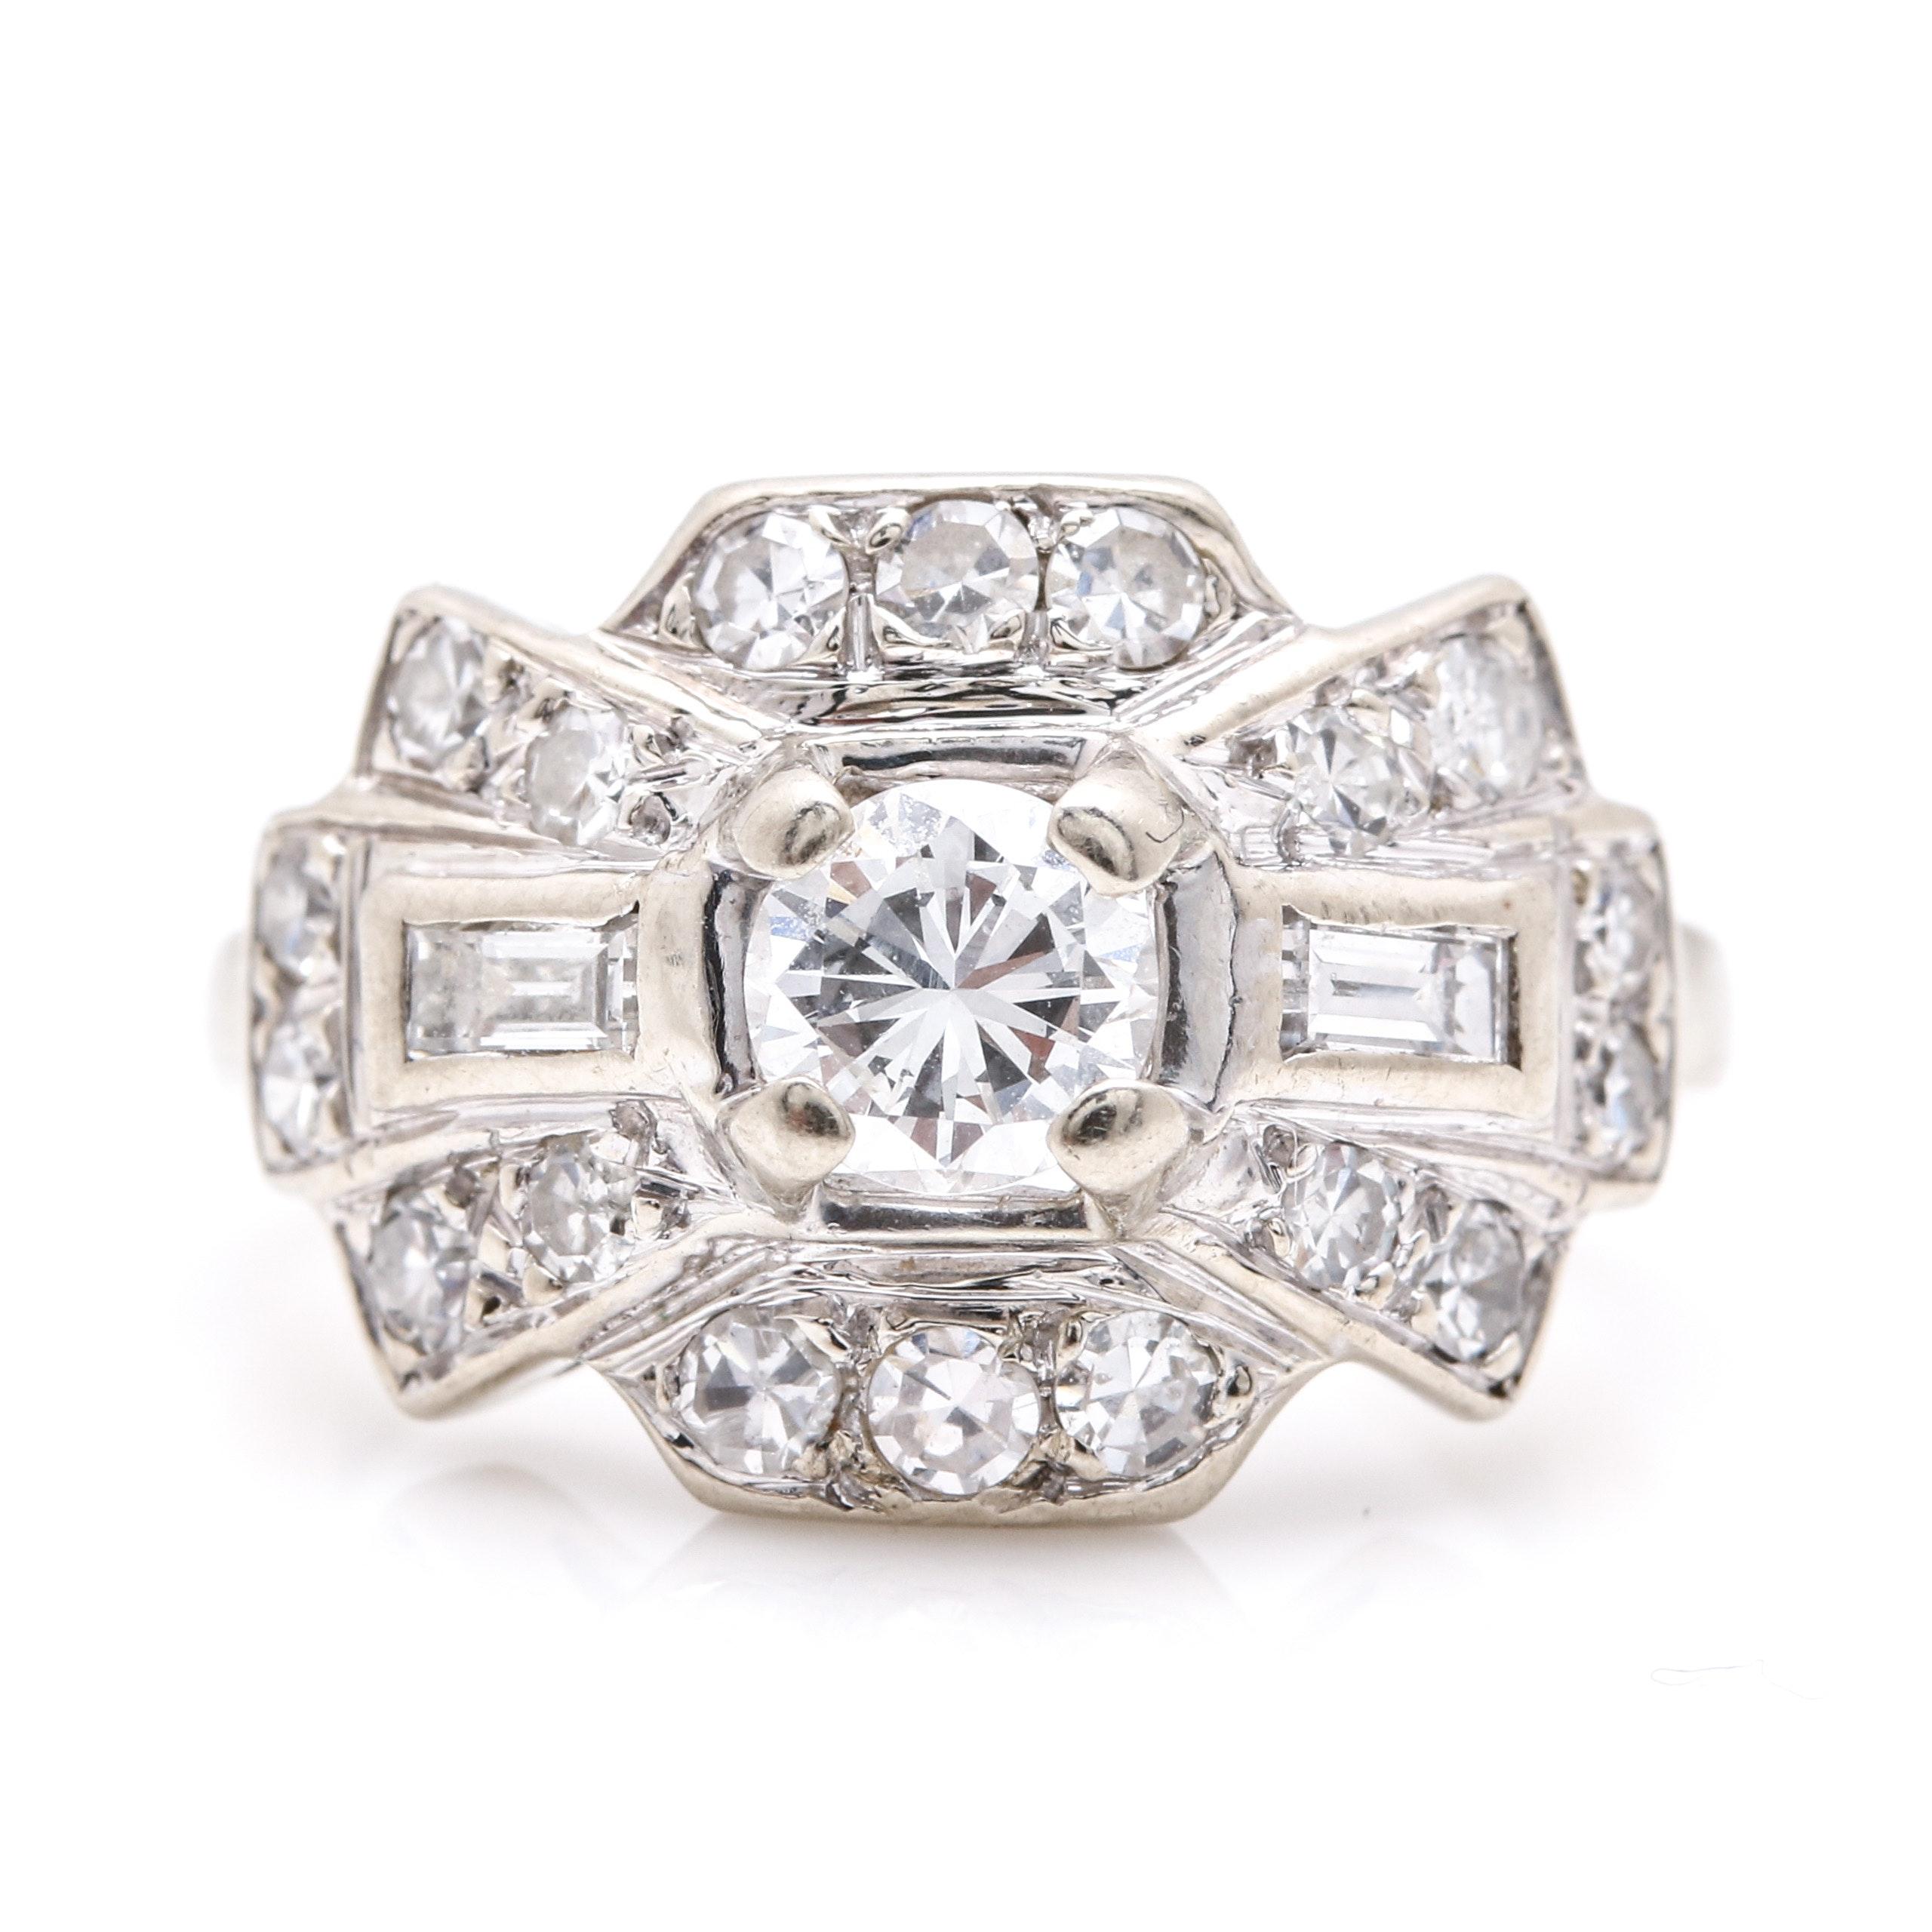 14K White Gold Art Deco Style 0.83 CTW Diamond Ring